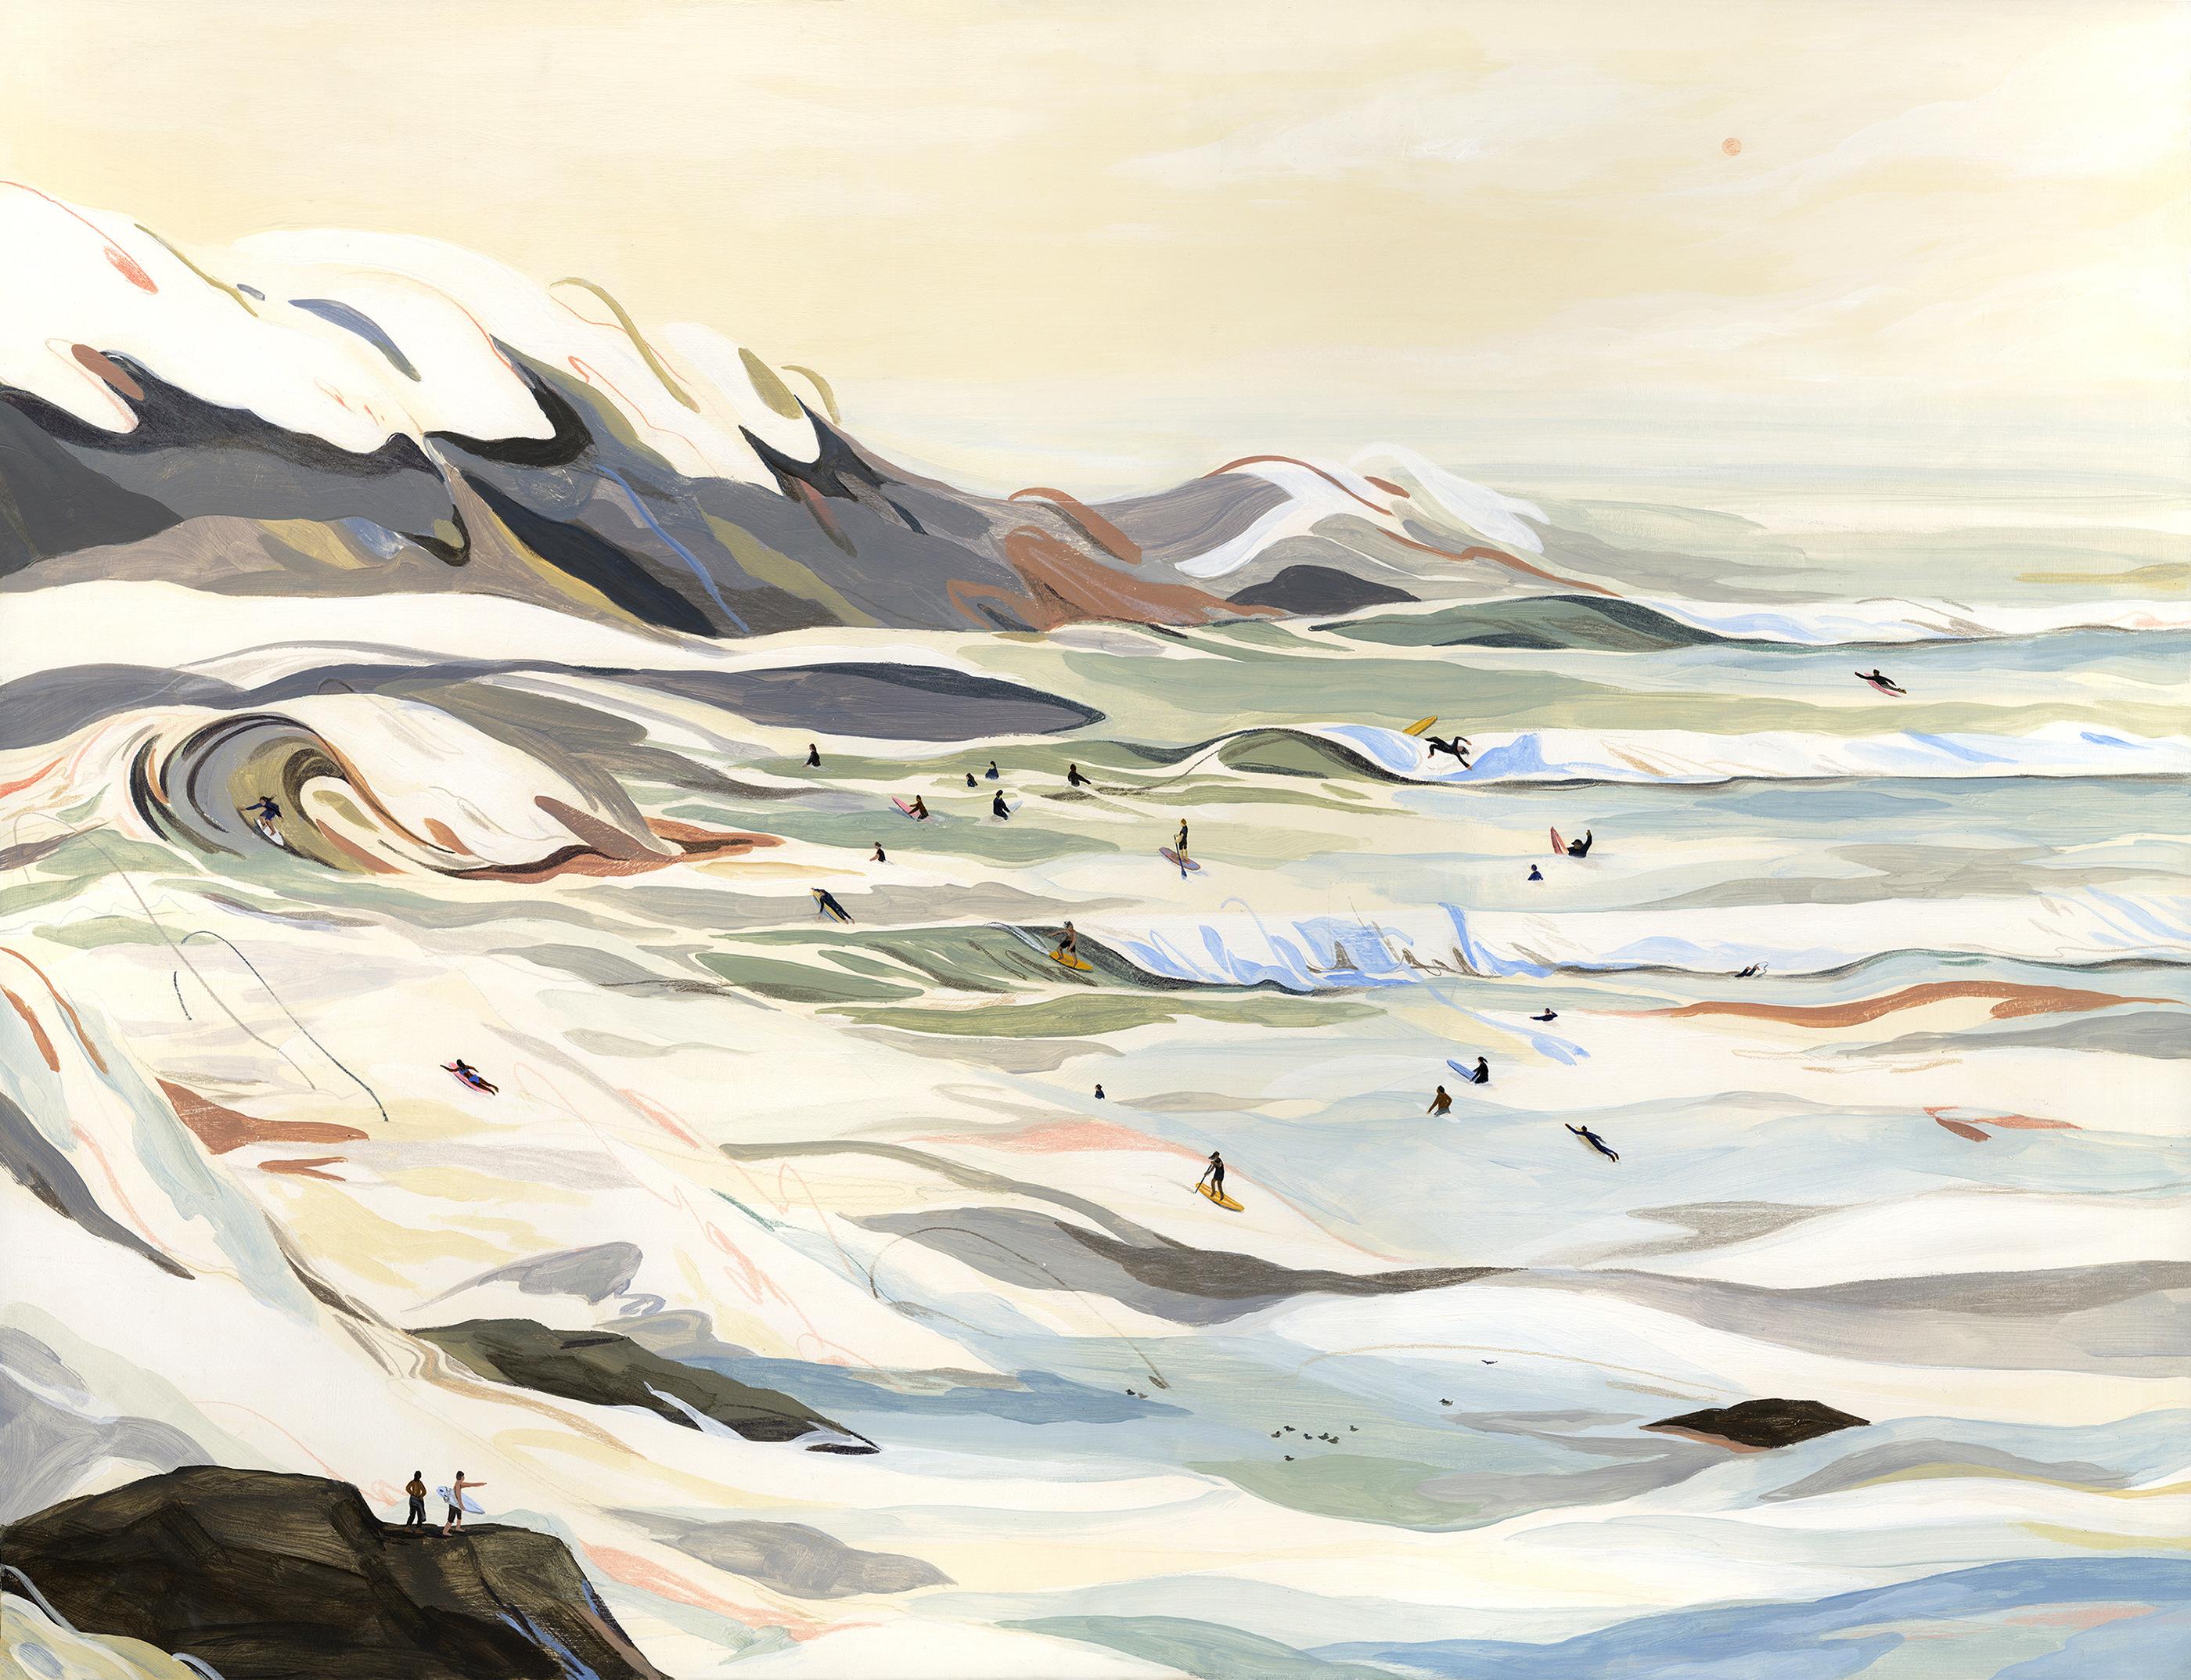 Illustration by Sally Deng